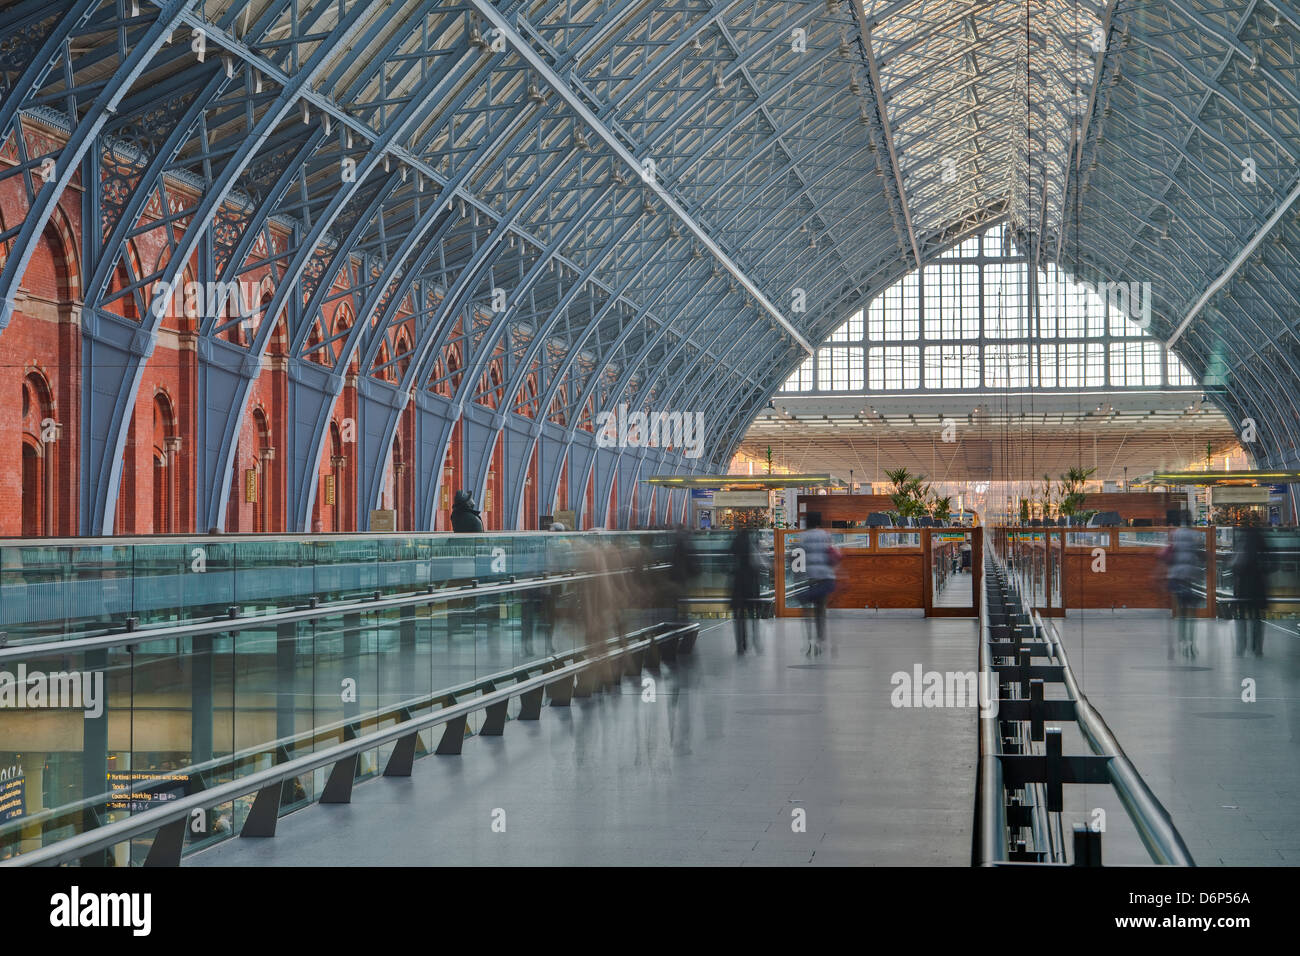 St. Pancras International railway station, London, England, United Kingdom, Europe - Stock Image